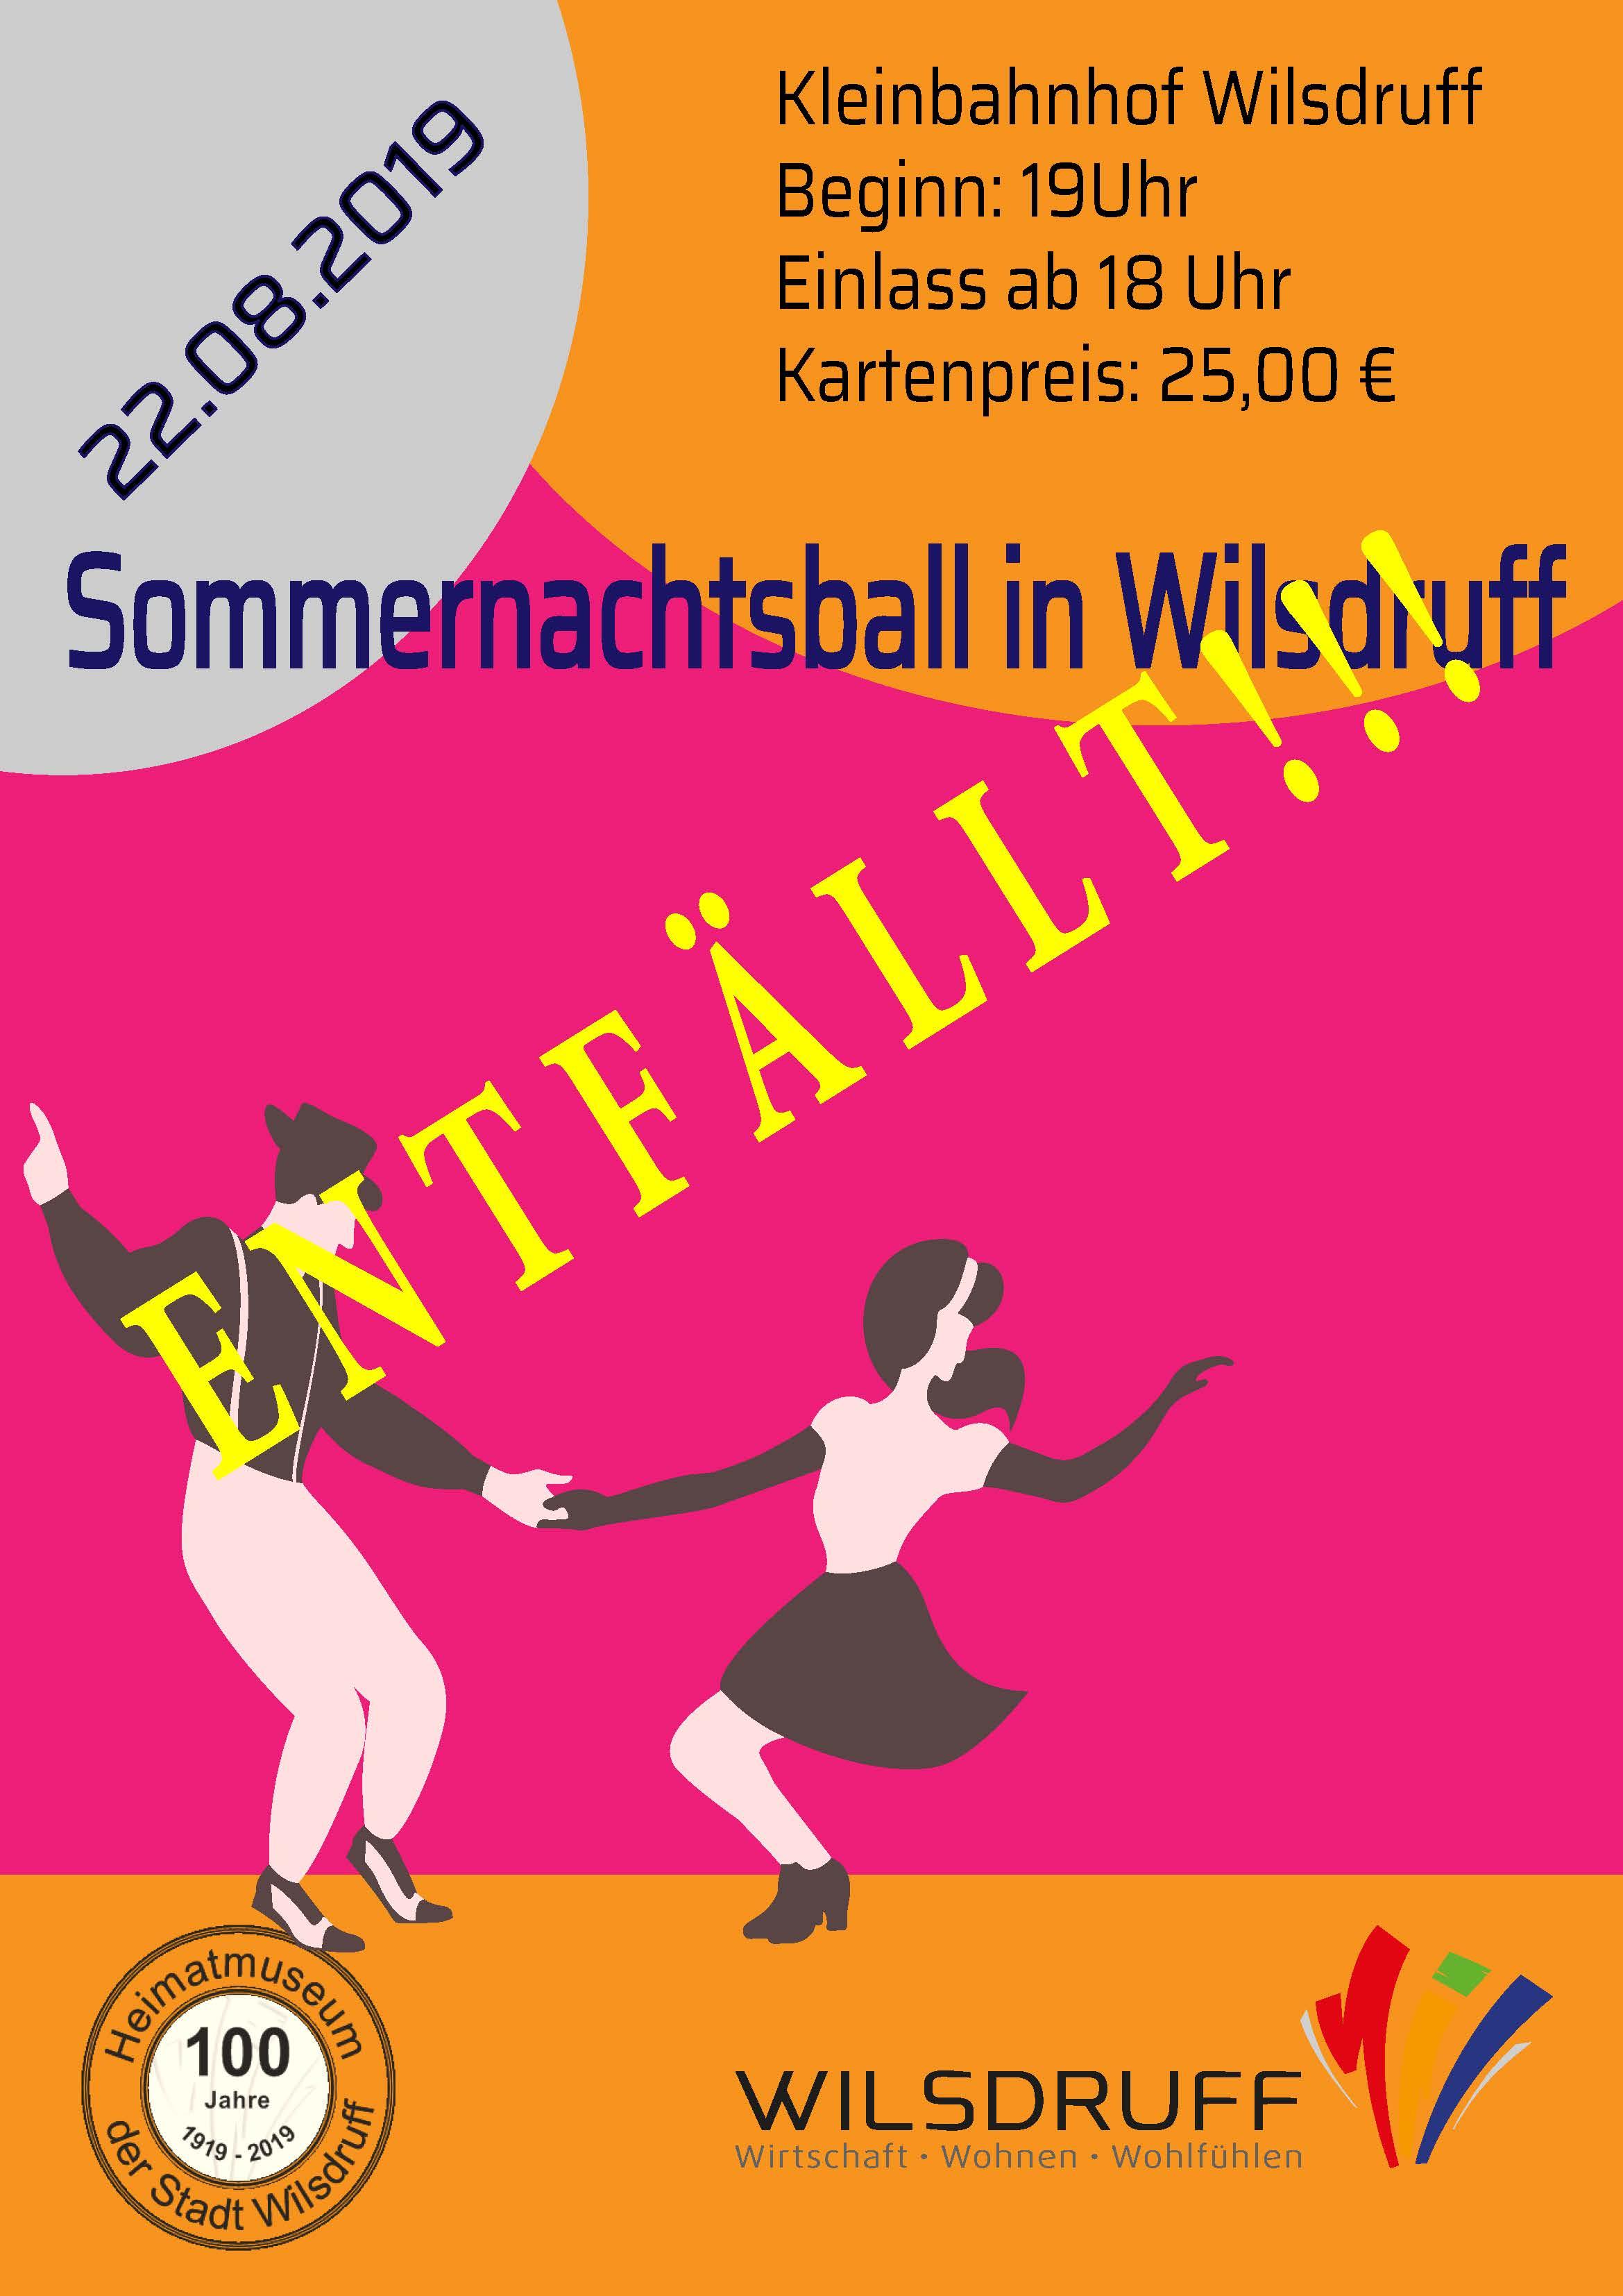 2019-08-22_Sommernachtsball_Heimatmuseum_entfällt.jpg